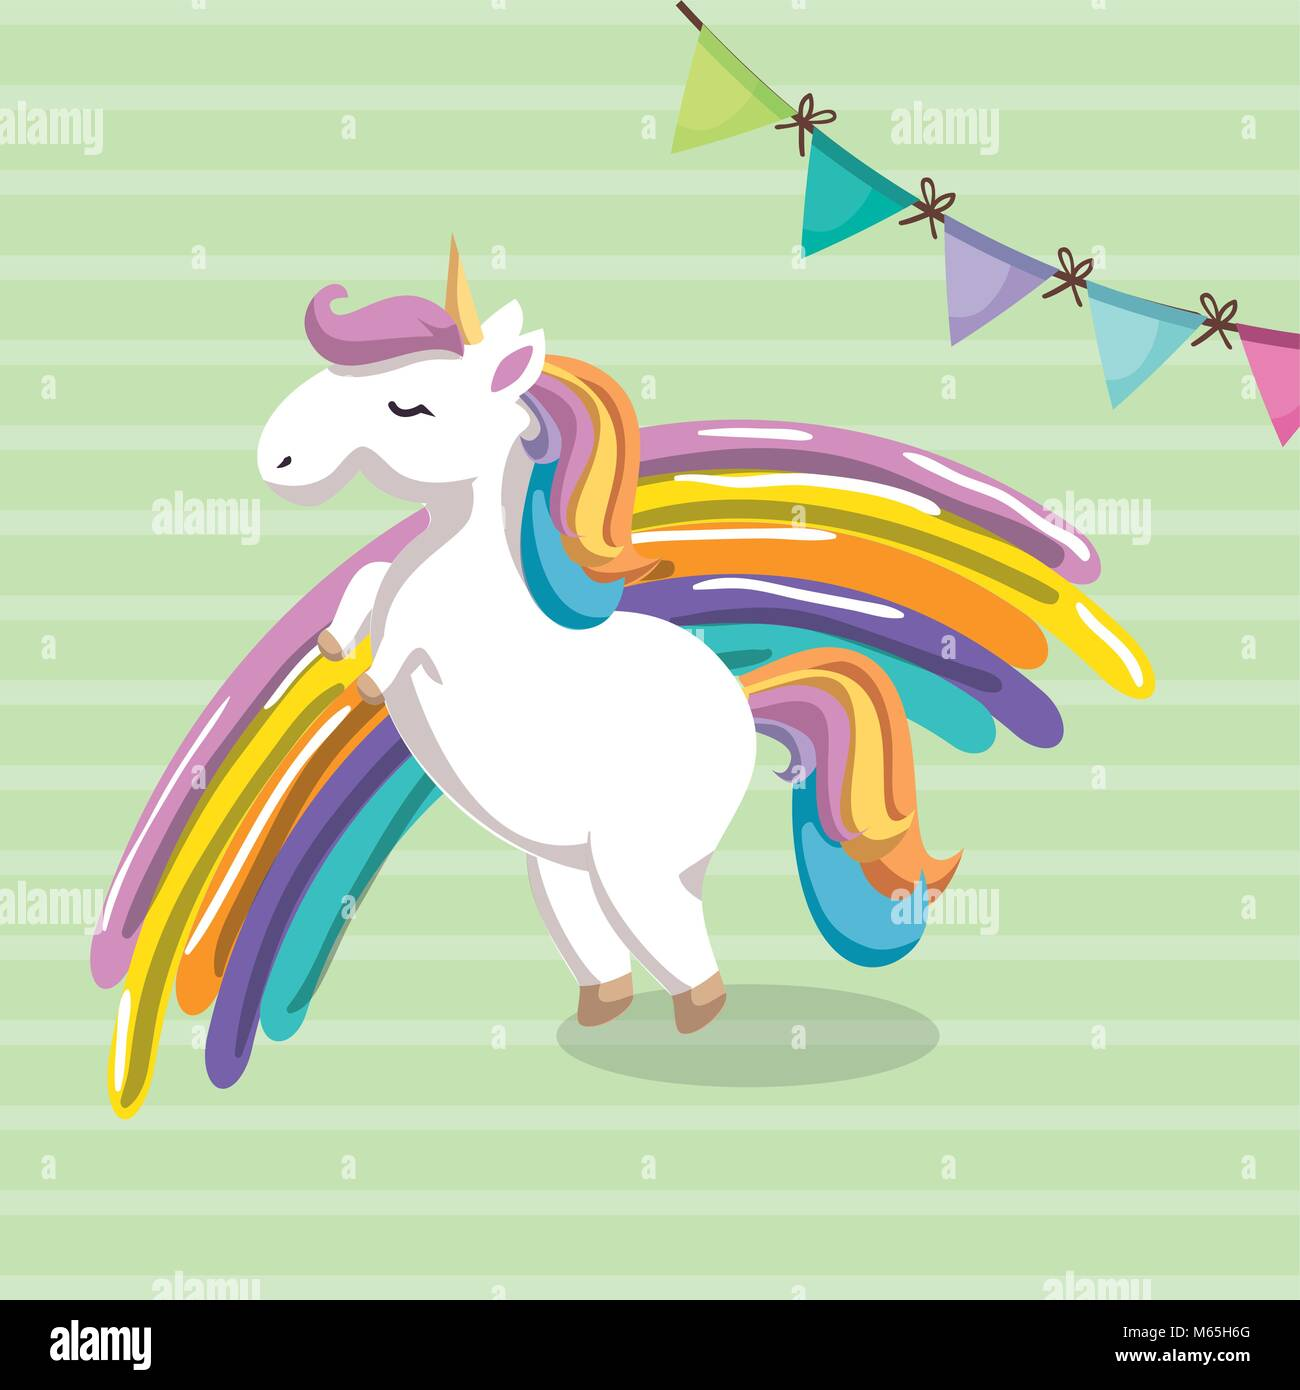 süße einhorn mit rainbow kawaii charakter geburtstagskarte